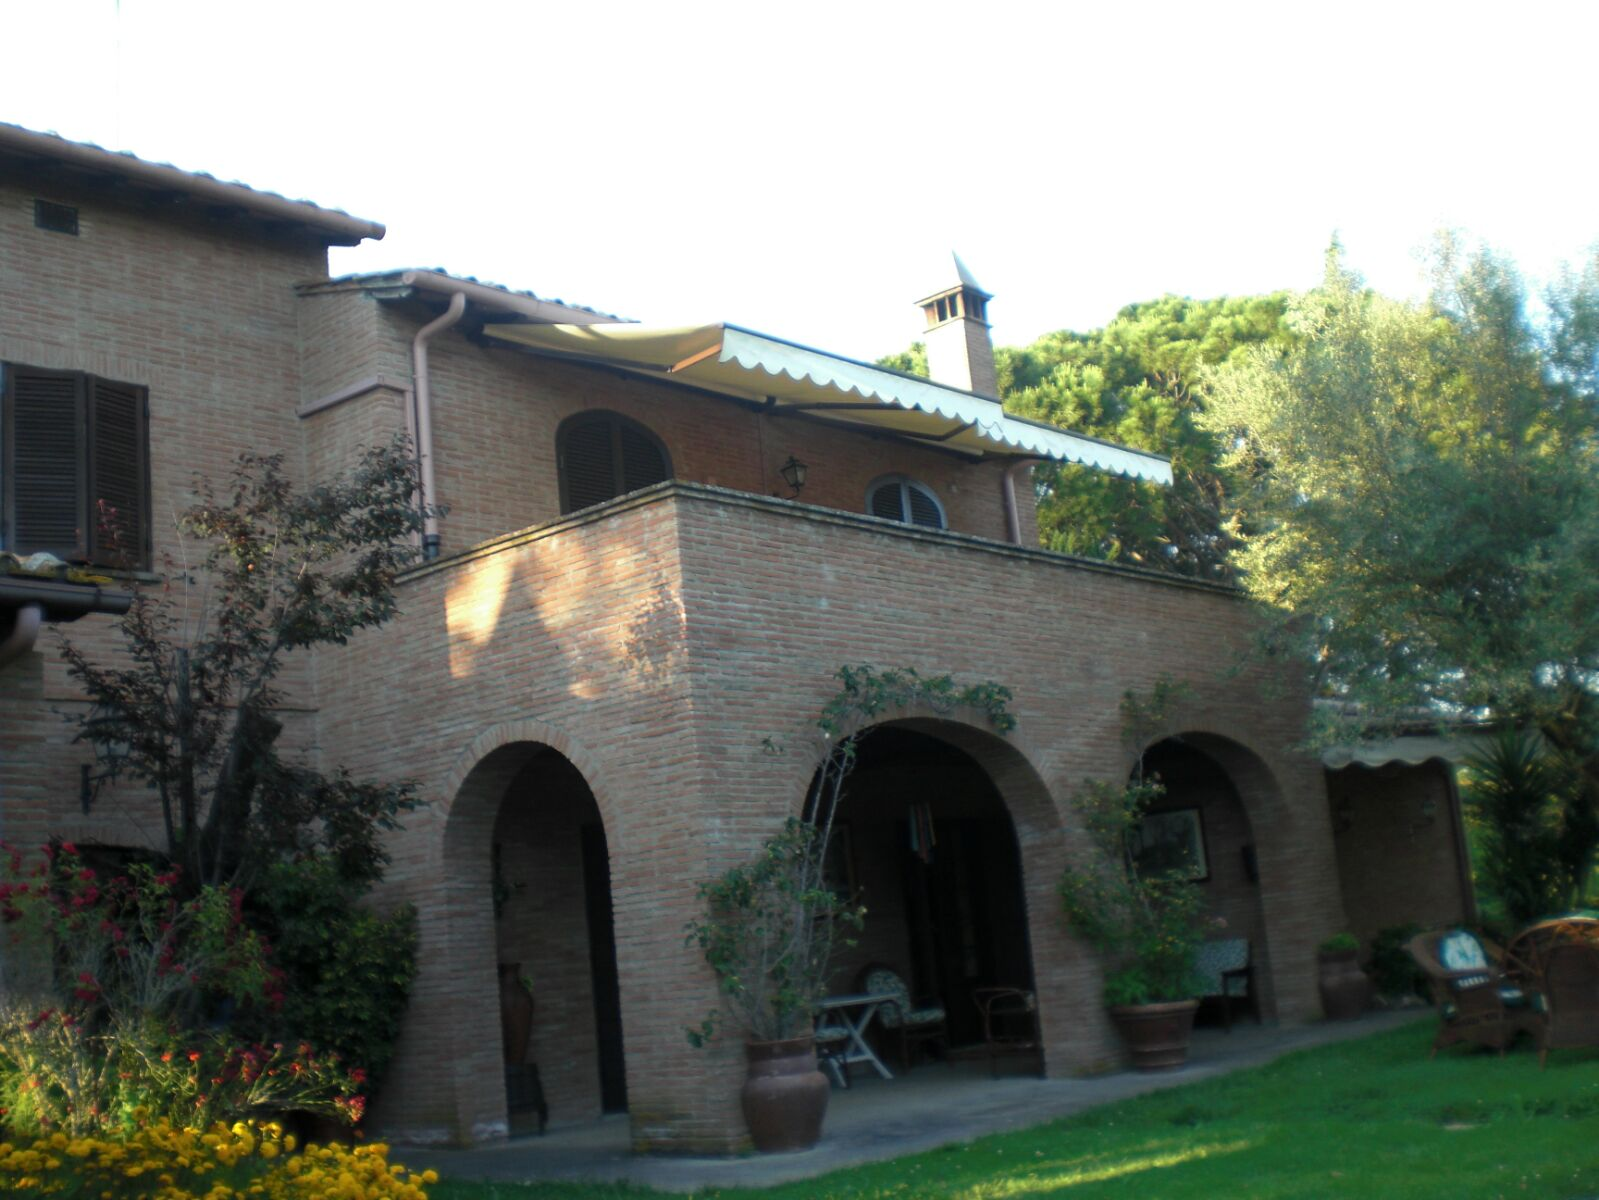 Gazebo roma in vendita pagina 9 waa2 for Casa di 700 metri quadrati in vendita